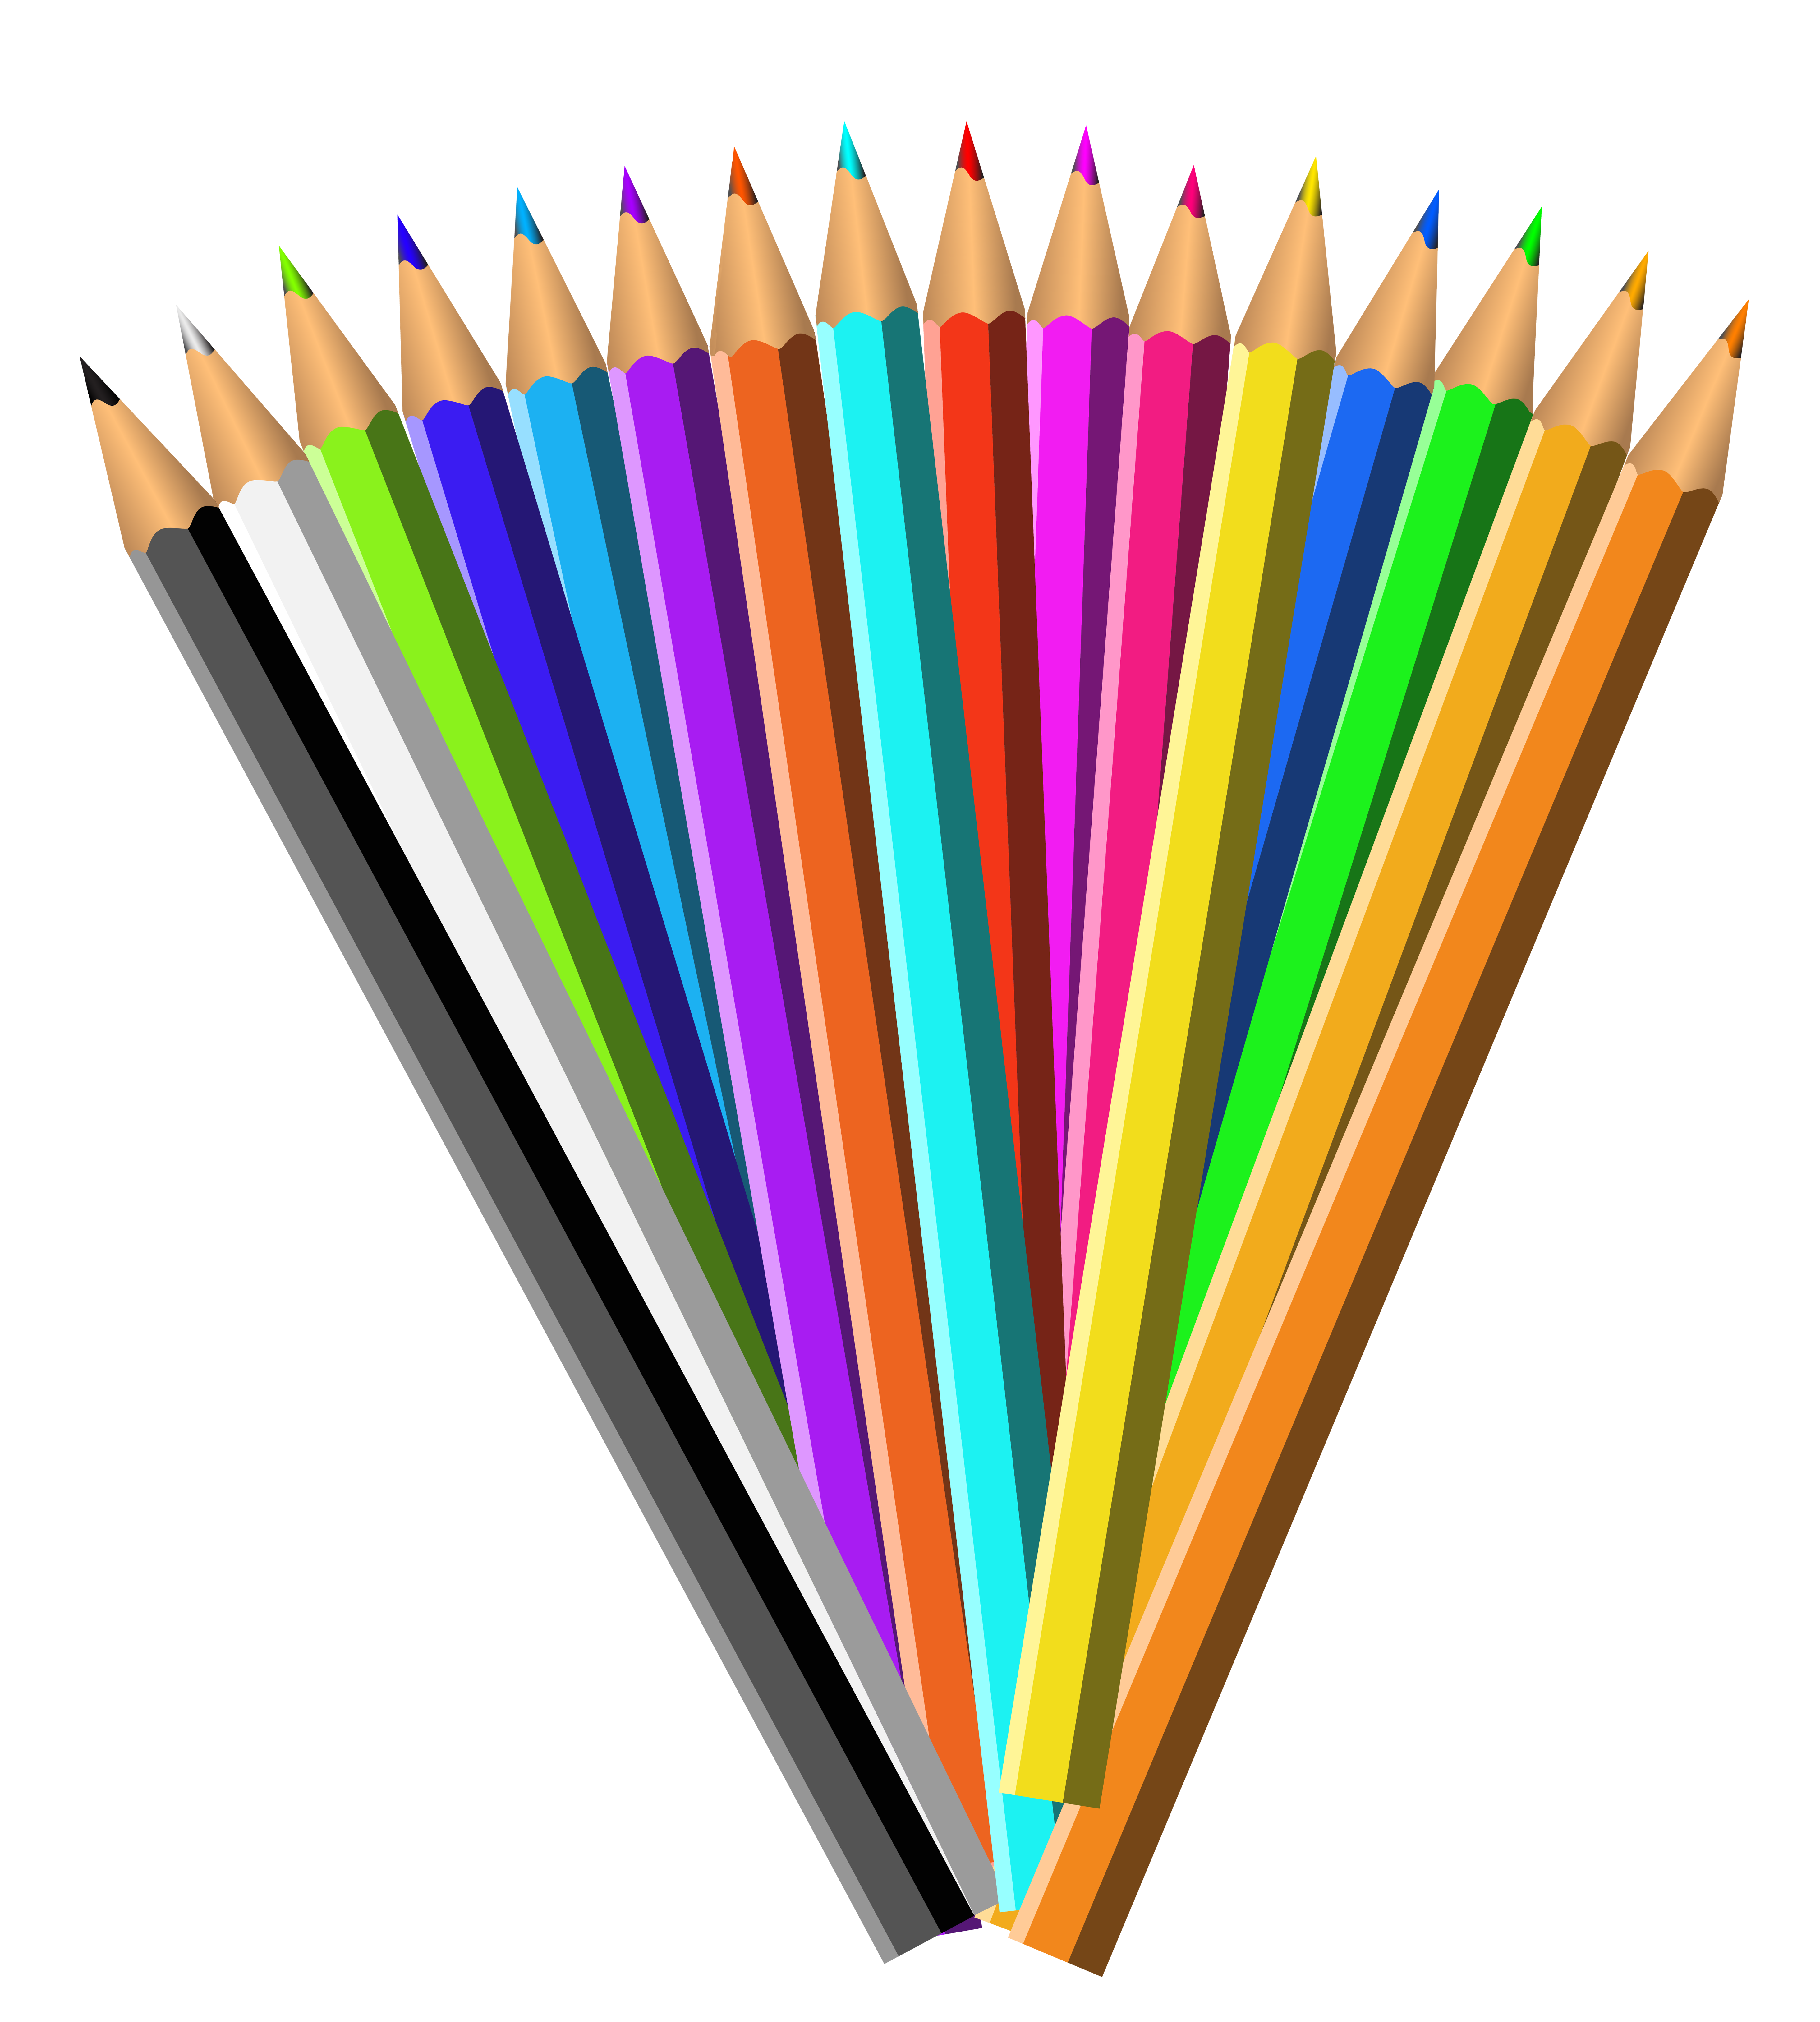 School pencils clipart jpg Pencils PNG Clipart Transparent Image | Gallery Yopriceville - High ... jpg